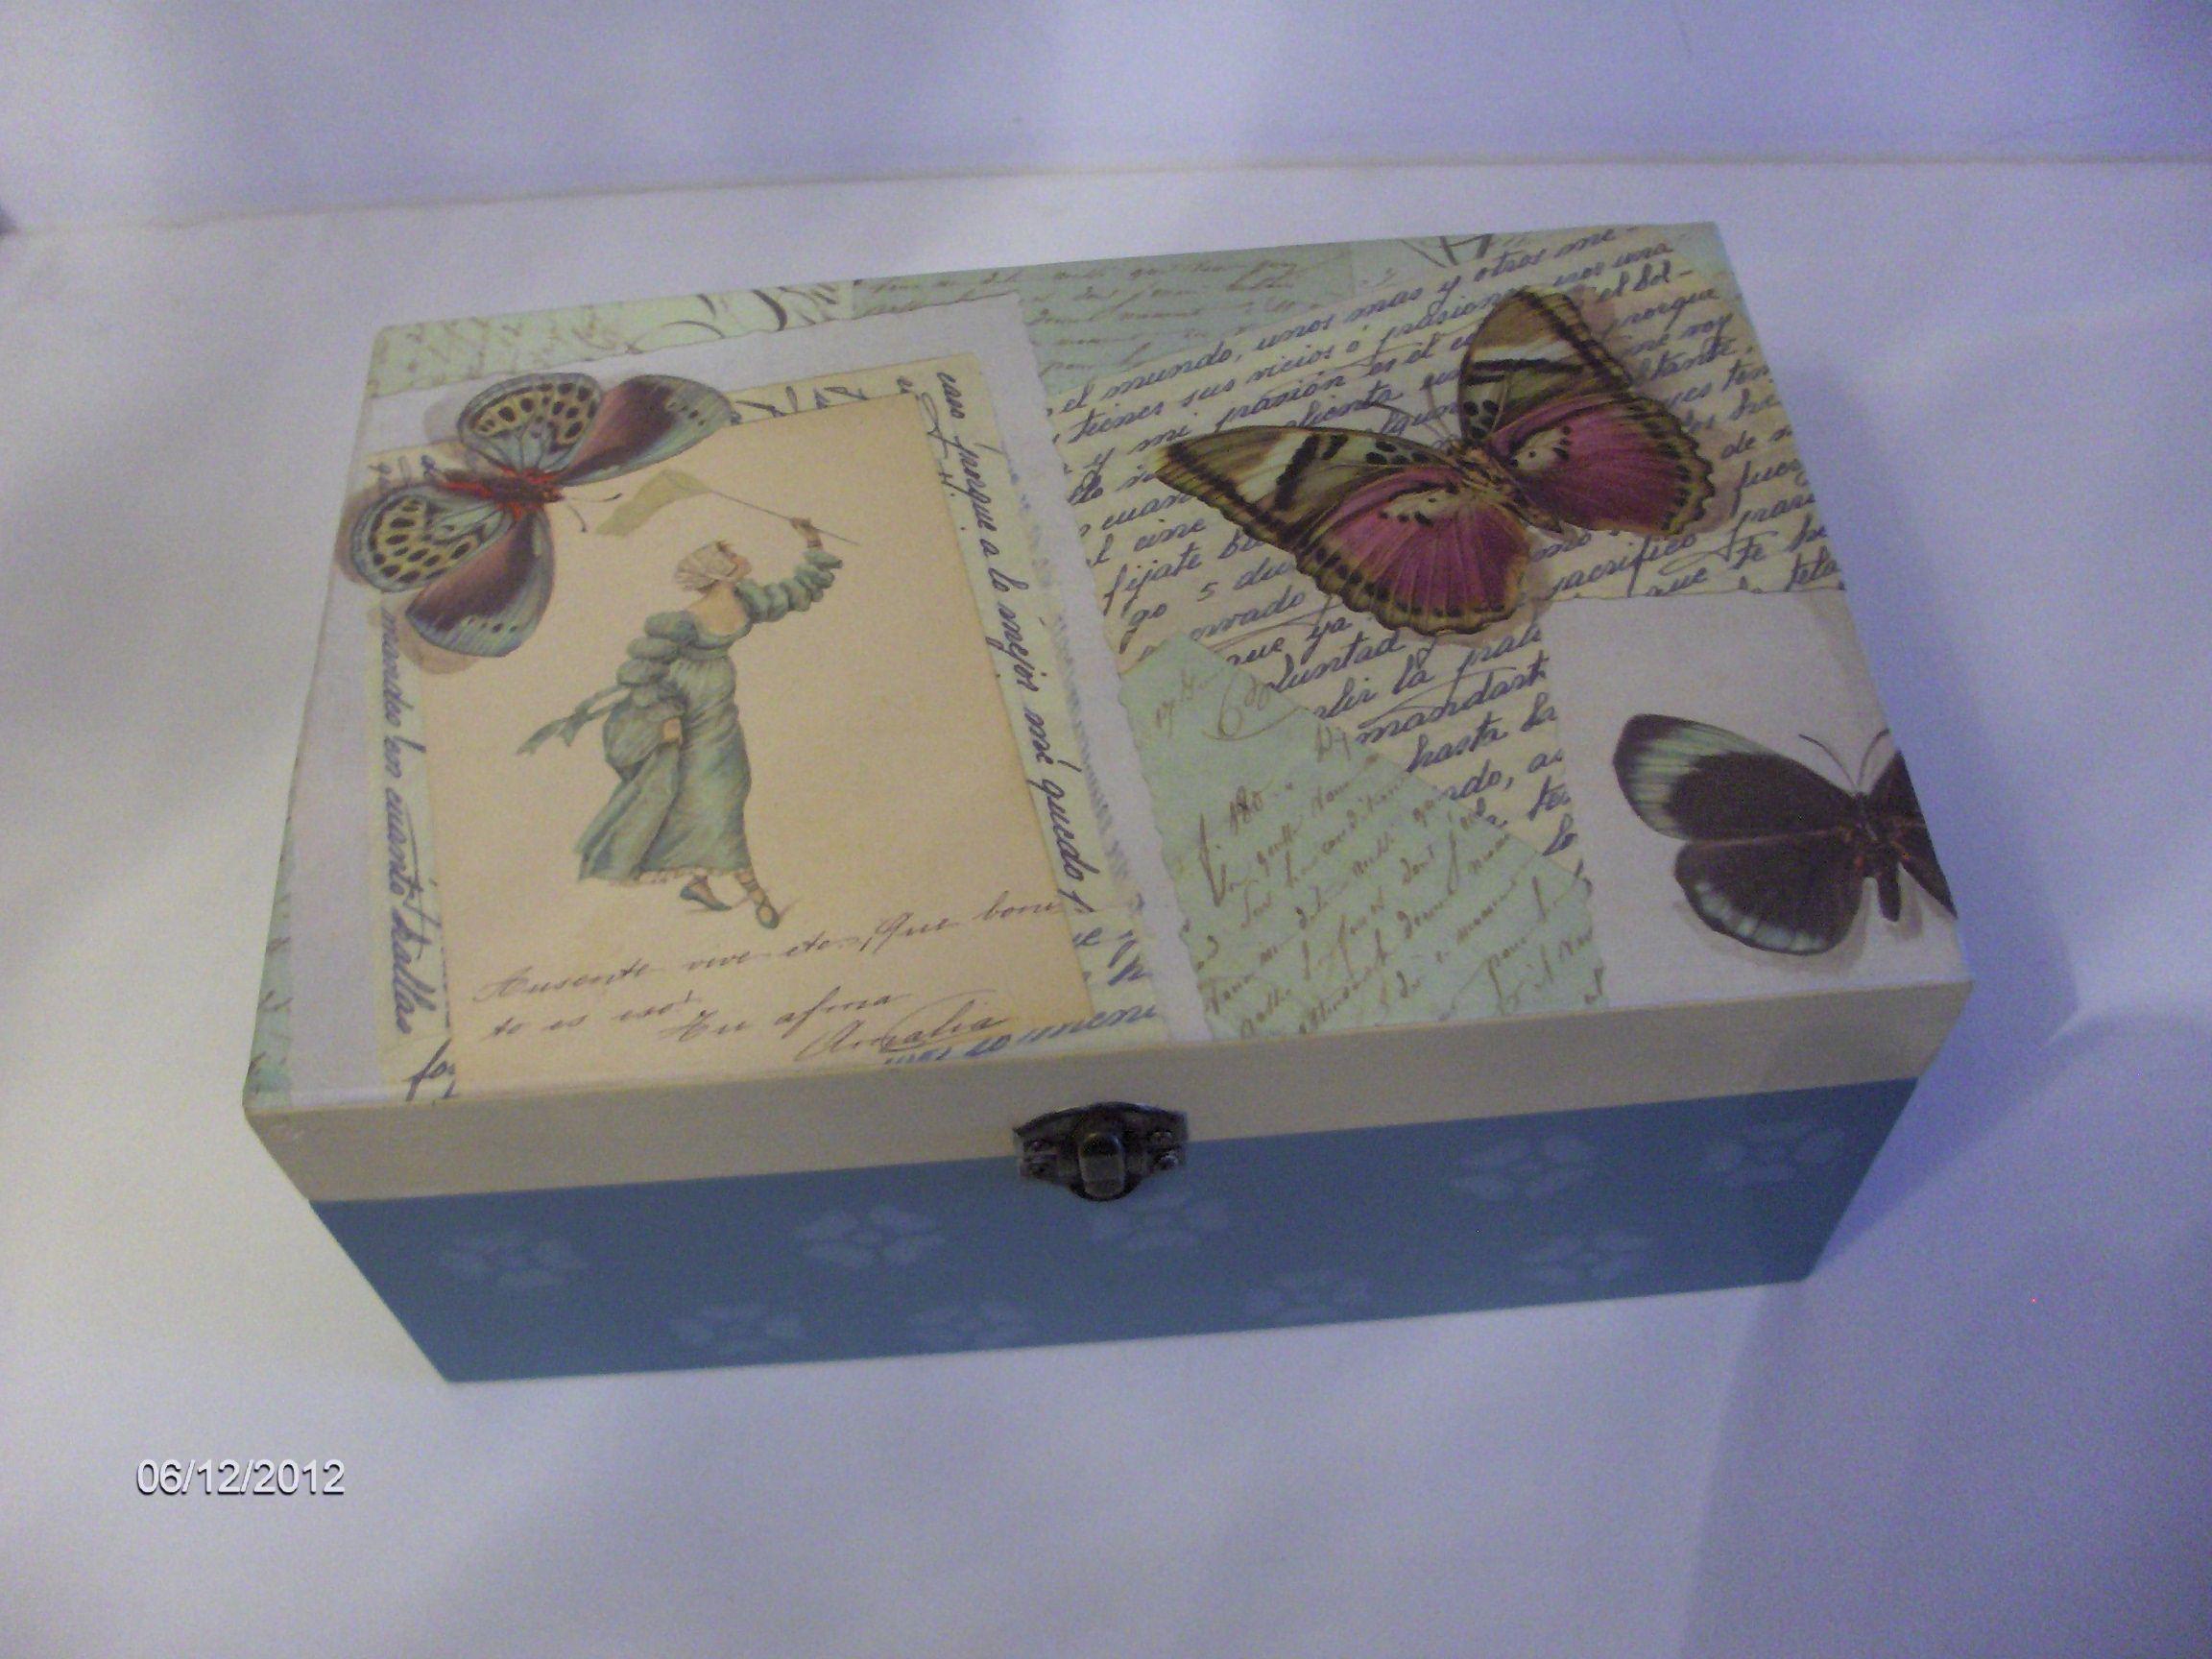 Cajas on pinterest manualidades picasa and hello kitty - Cajas de madera decoradas ...